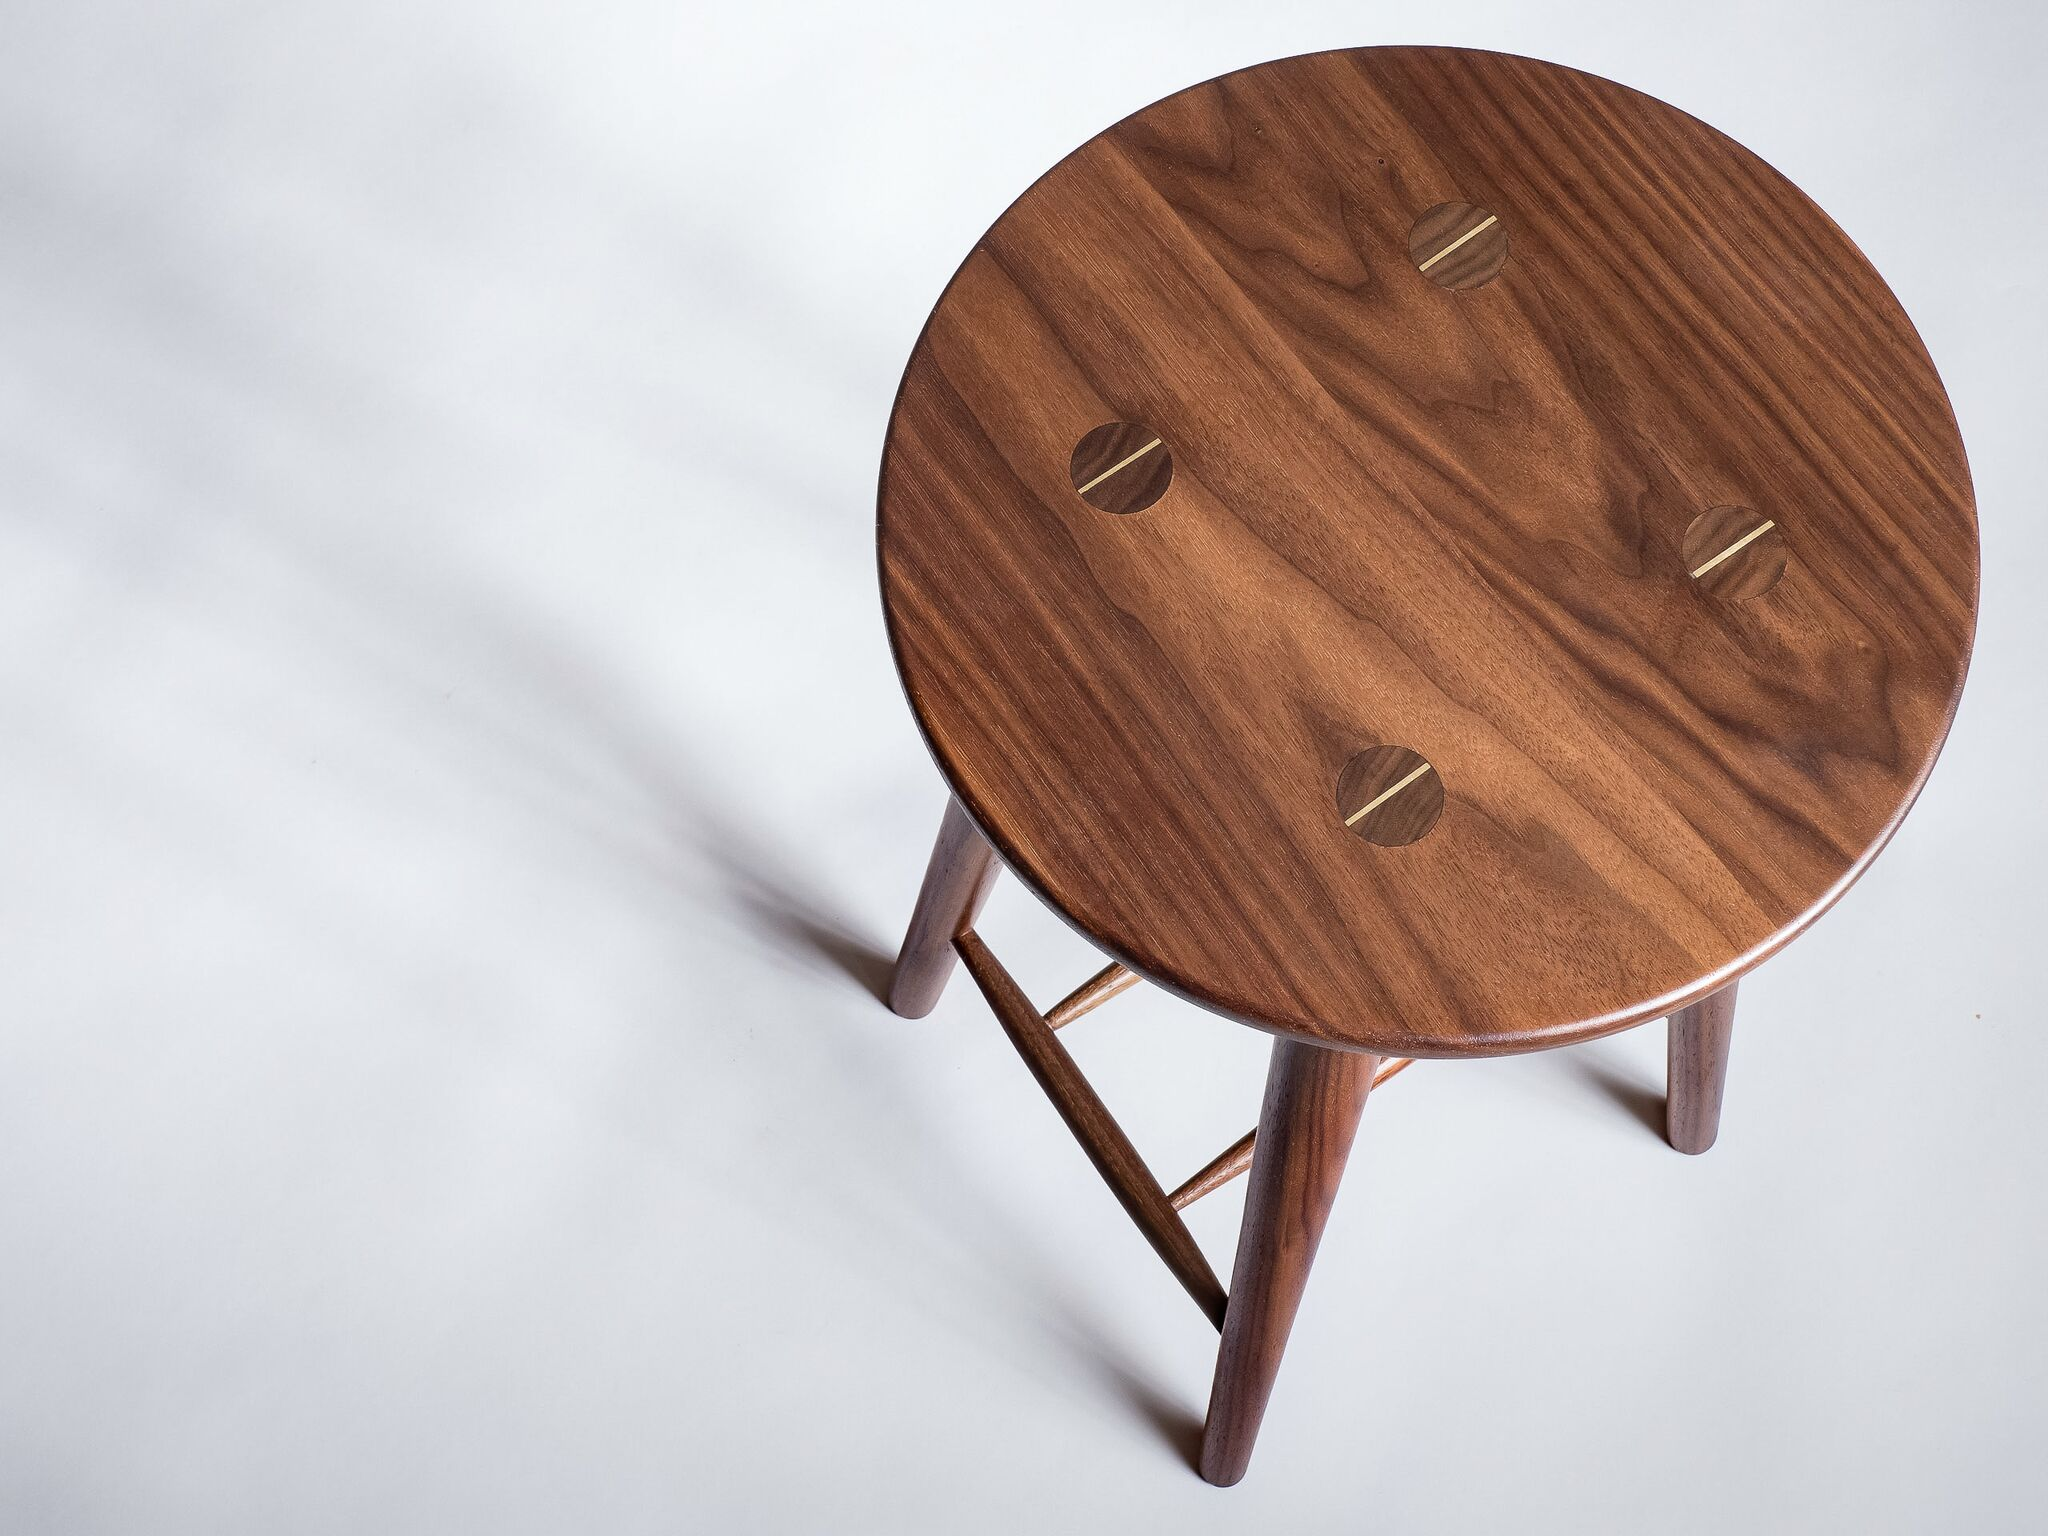 walnut-wood-brass-kitchen-island-modern-bar-stool.jpeg